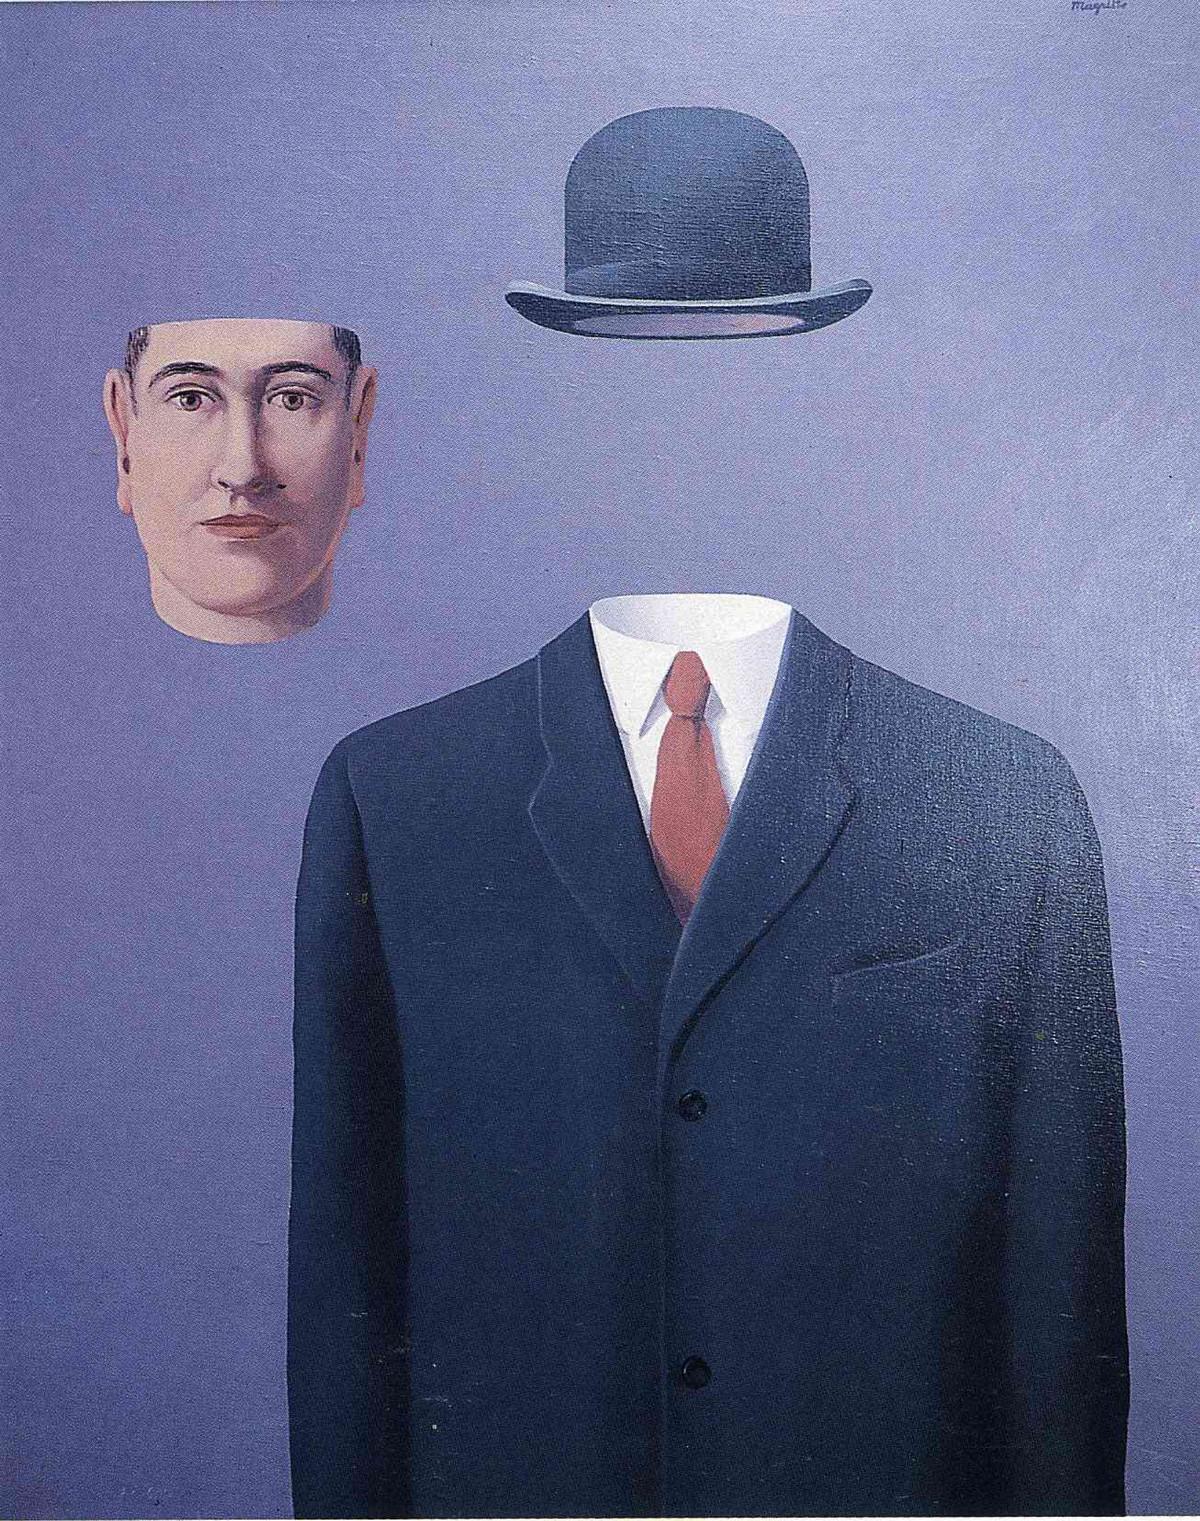 почему Рене Магритт был помешан на шляпах 7